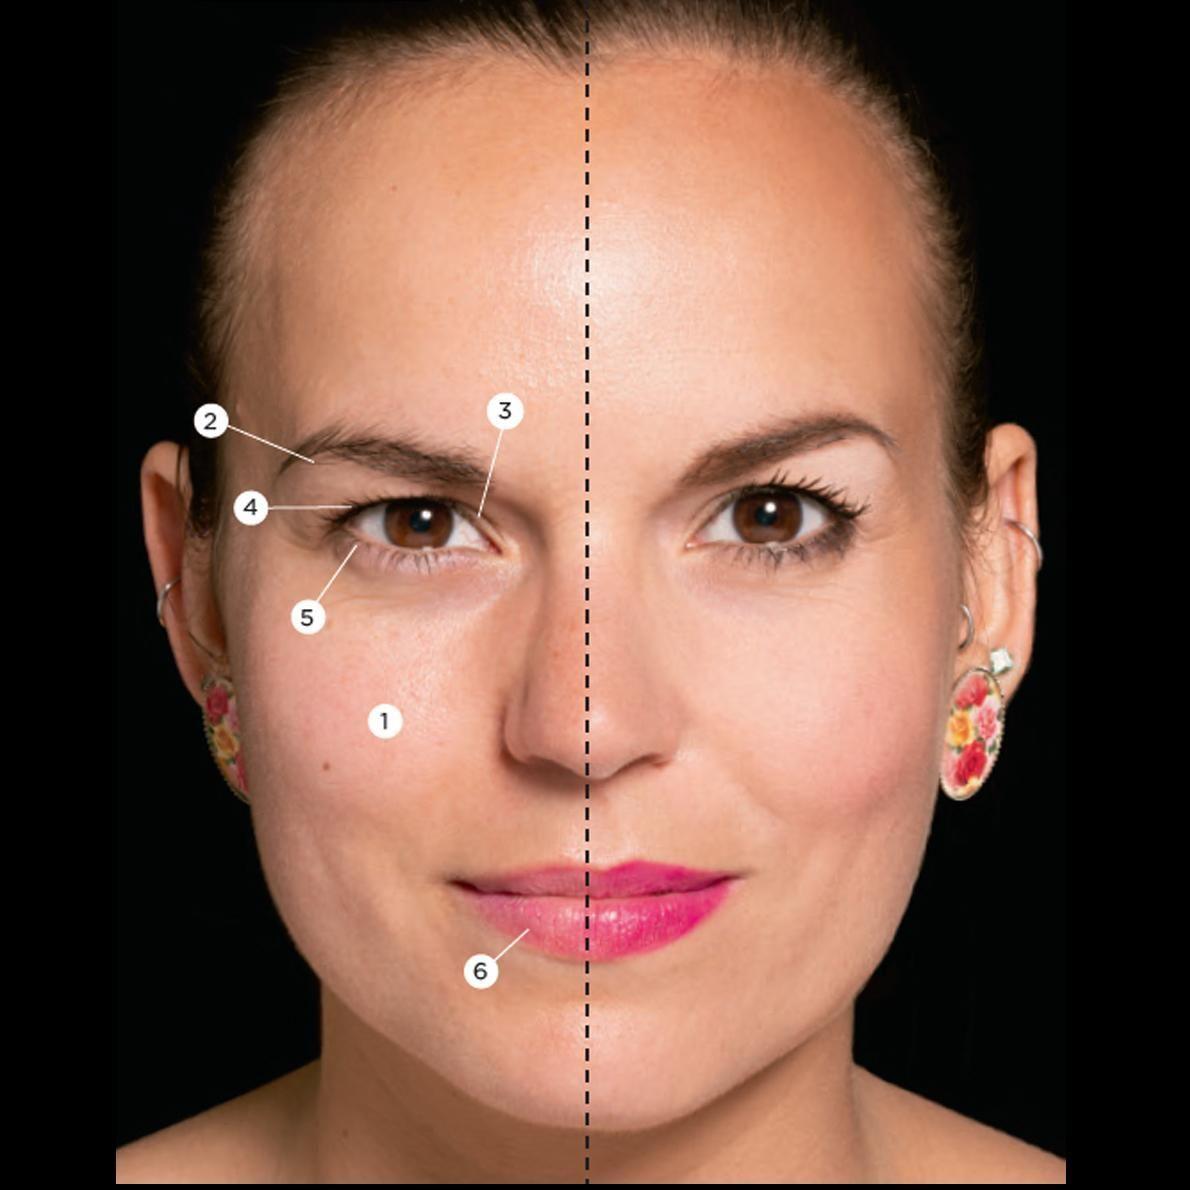 6 trucs maquillage pour agrandir son regard yeux. Black Bedroom Furniture Sets. Home Design Ideas